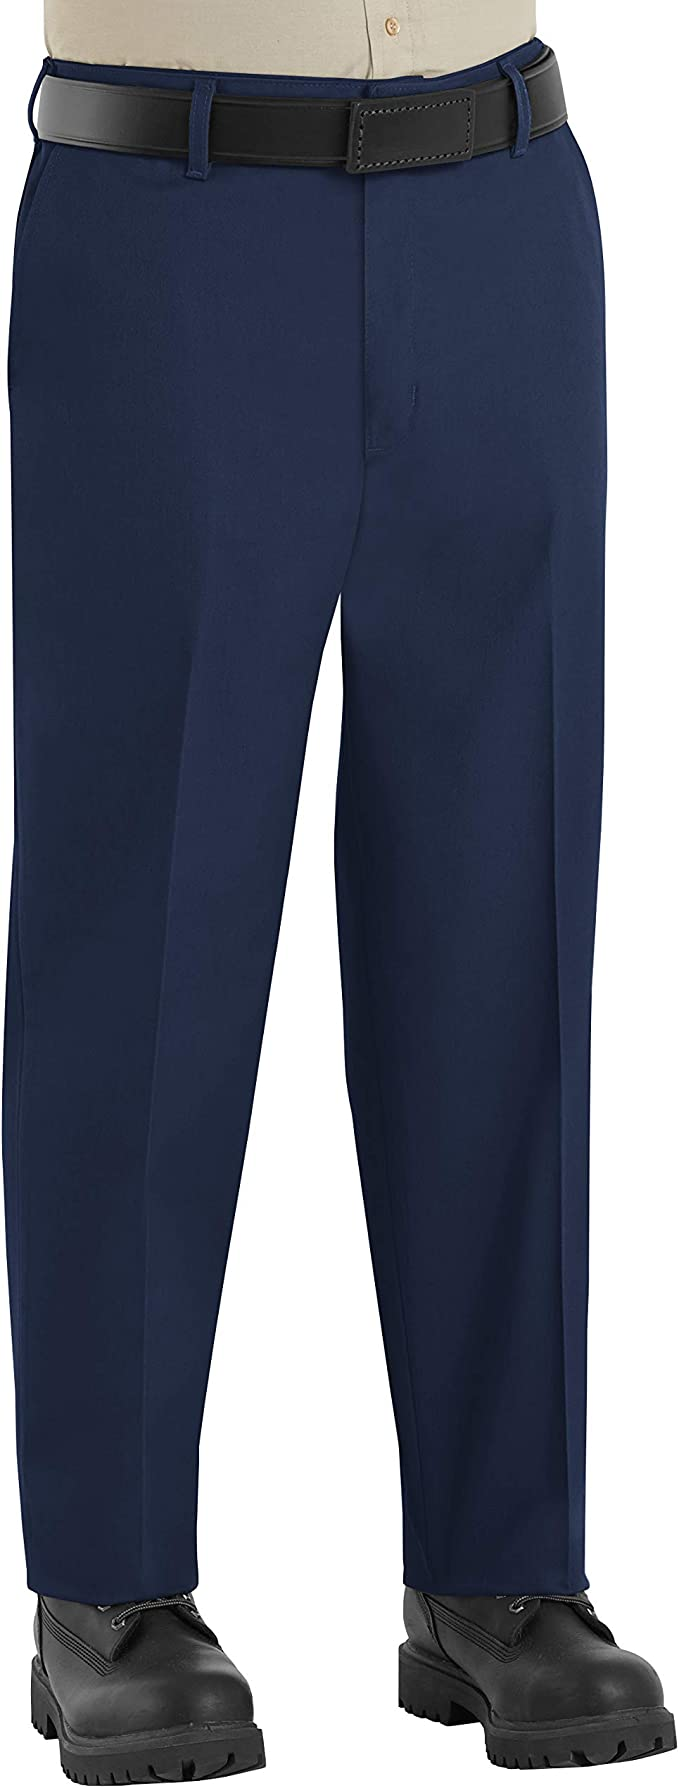 Red Kap Men S Elastic Insert Work Pant Clothing Amazon Com